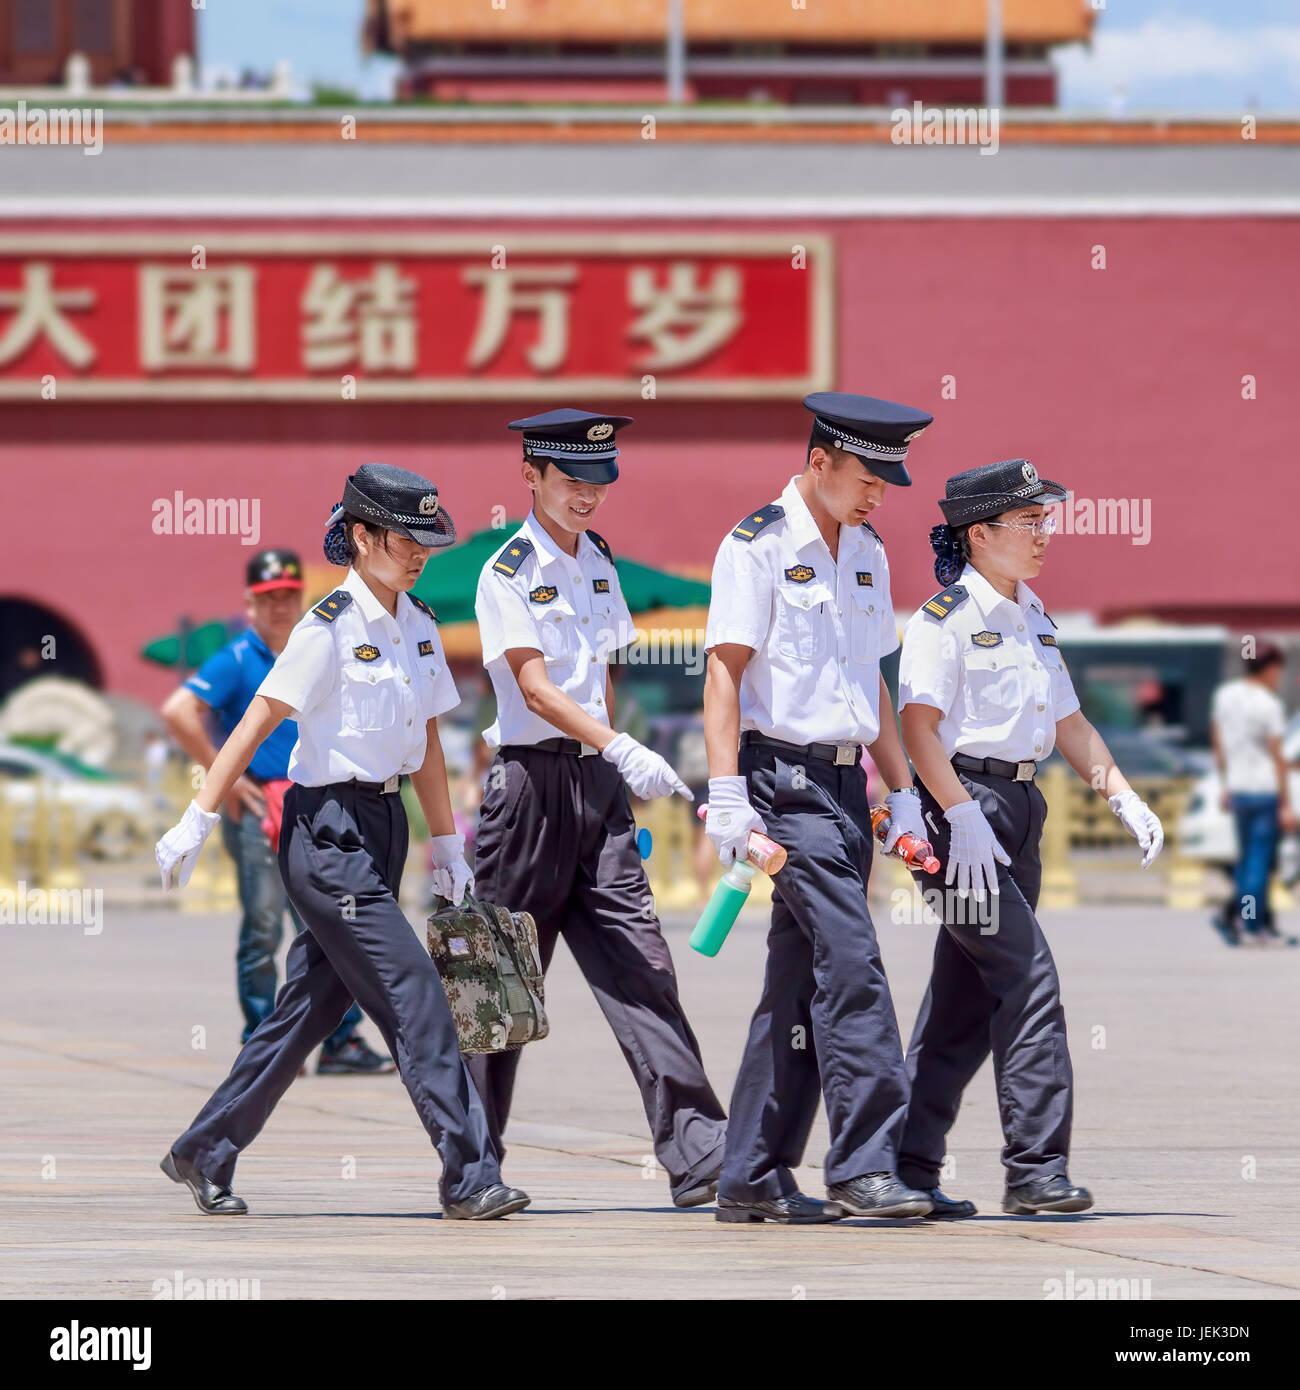 China Police: Police Uniform China Stock Photos & Police Uniform China